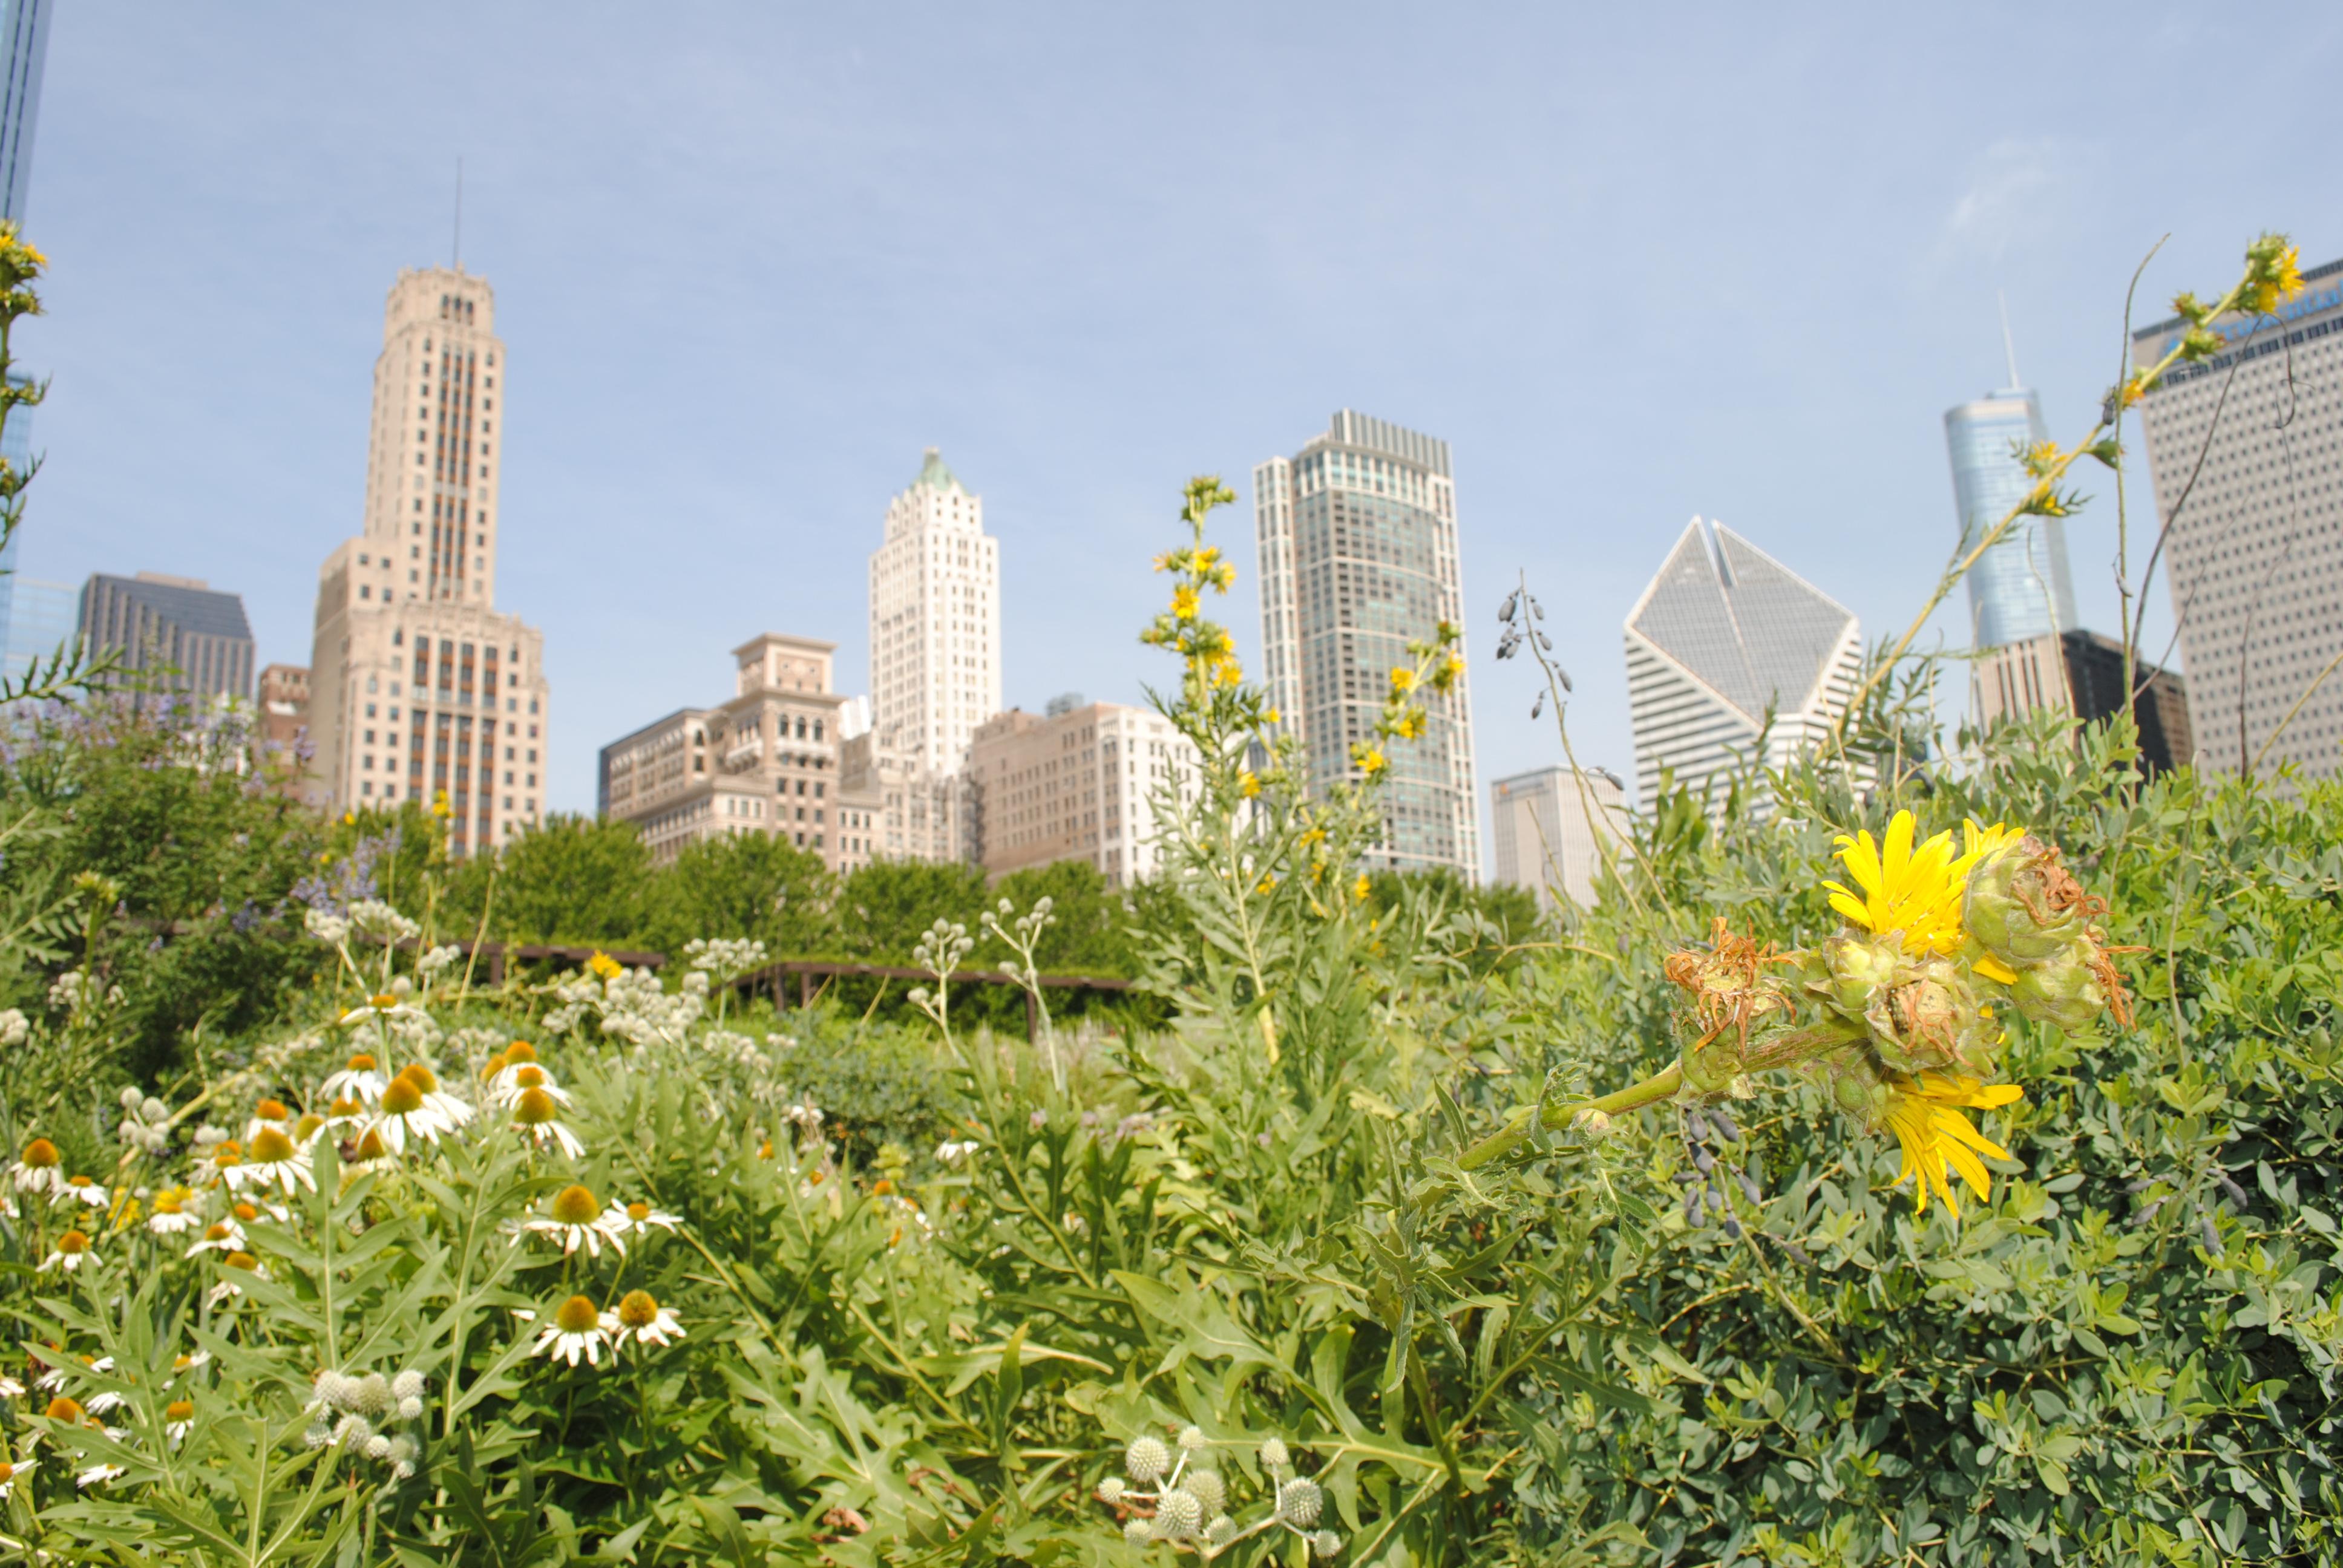 wildflowers in a city garden